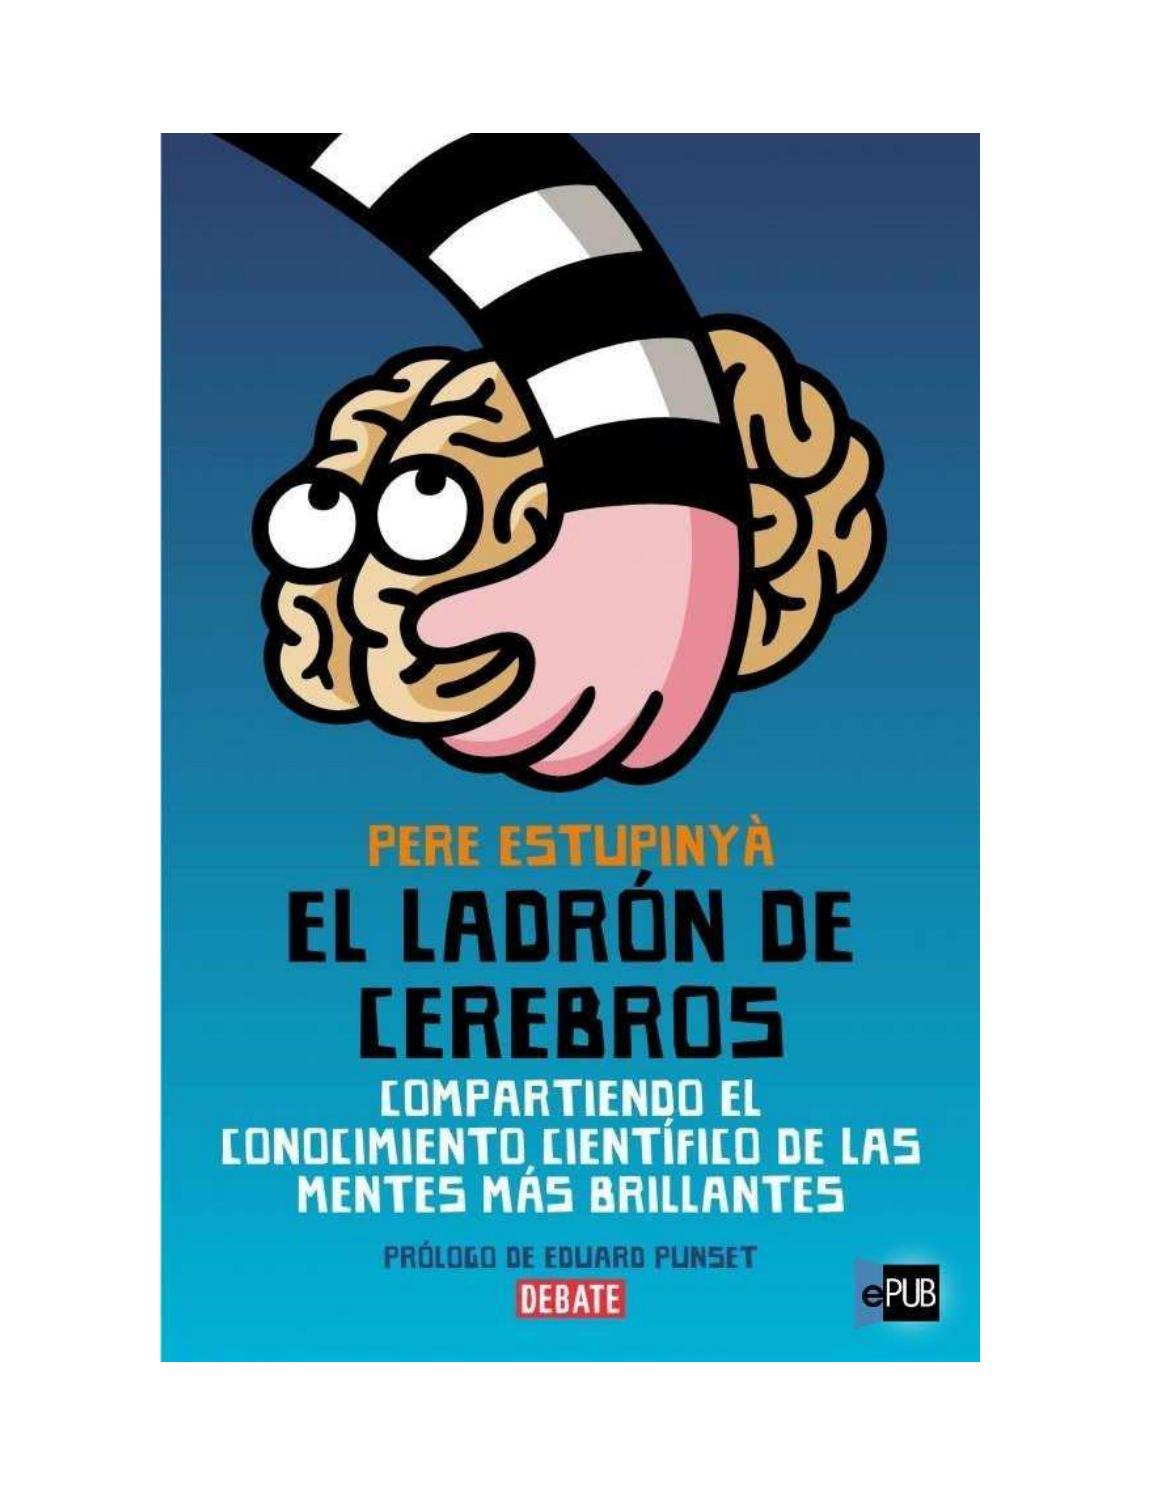 El ladrón de cerebros fb 260 by Naibeth - issuu ddc6770eaf1